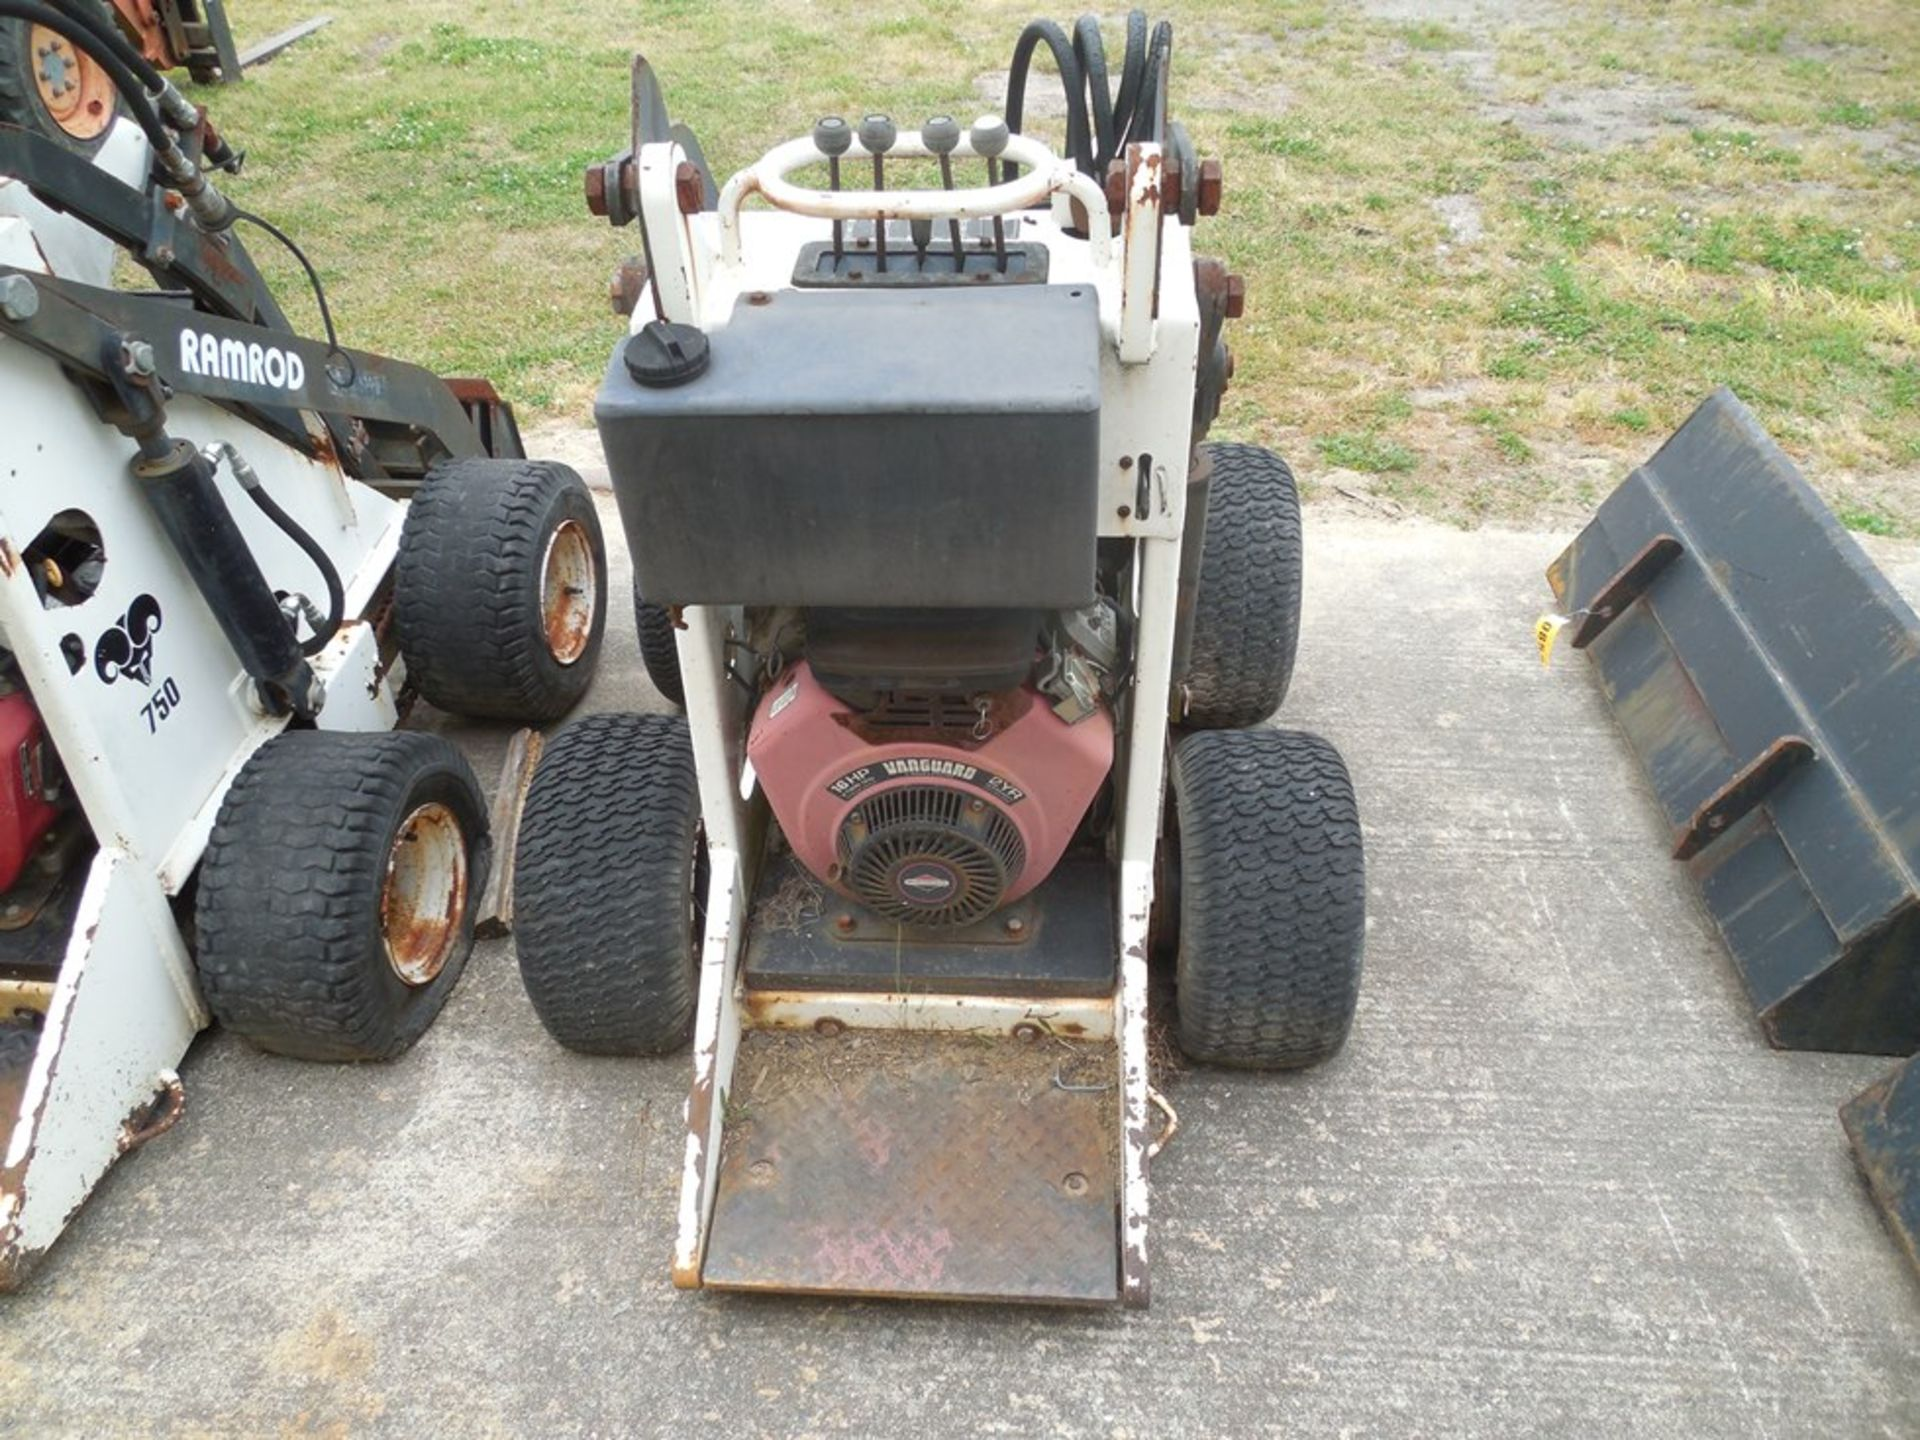 Ram Rod Mini Skid loader model 750A NOT RUNNING - Image 2 of 2